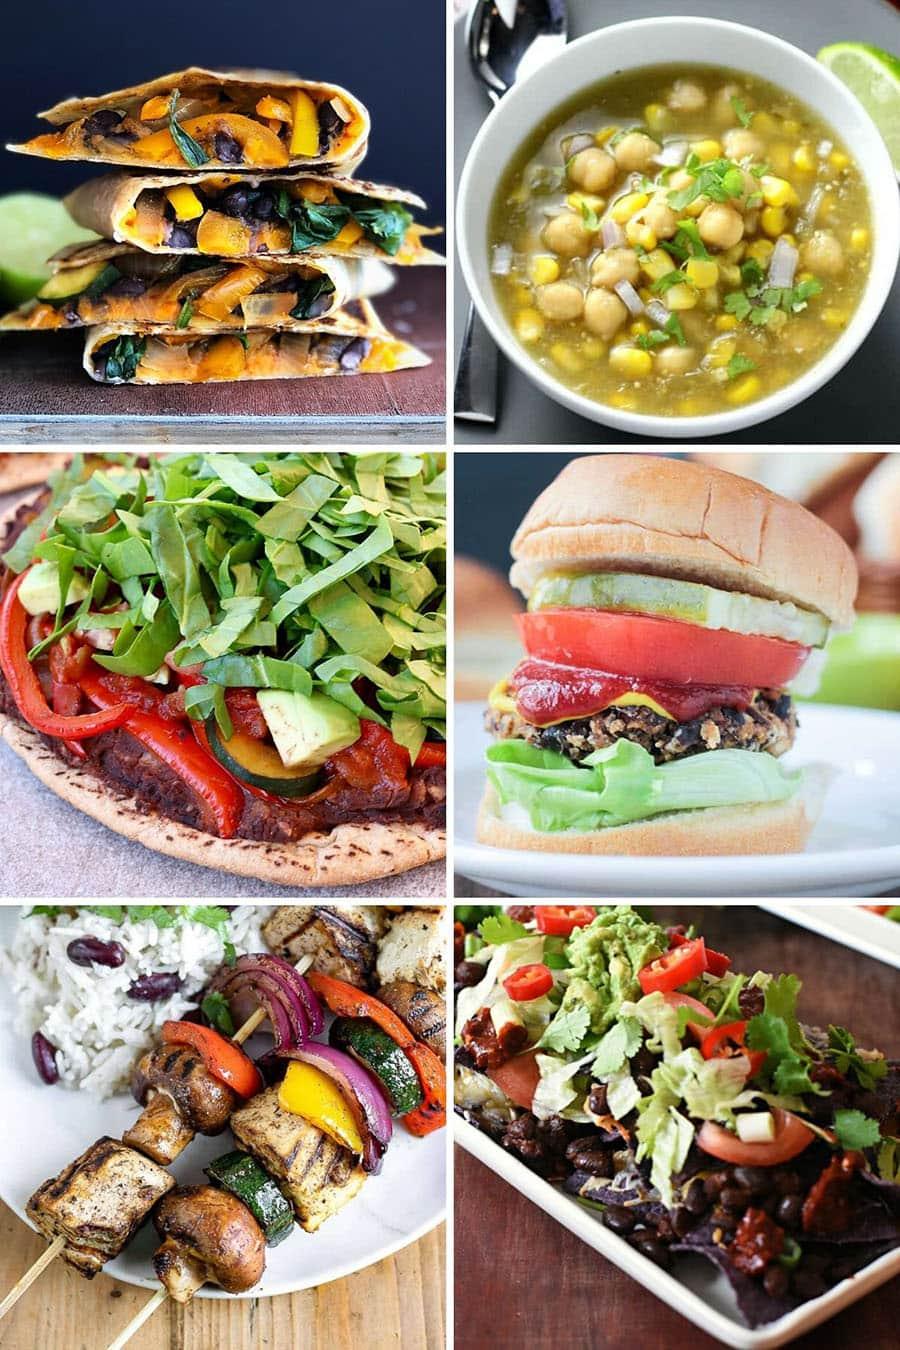 Collage of 6 vegan dinner recipes: quesadilla, chili, pizza, burger, skewer, nachos